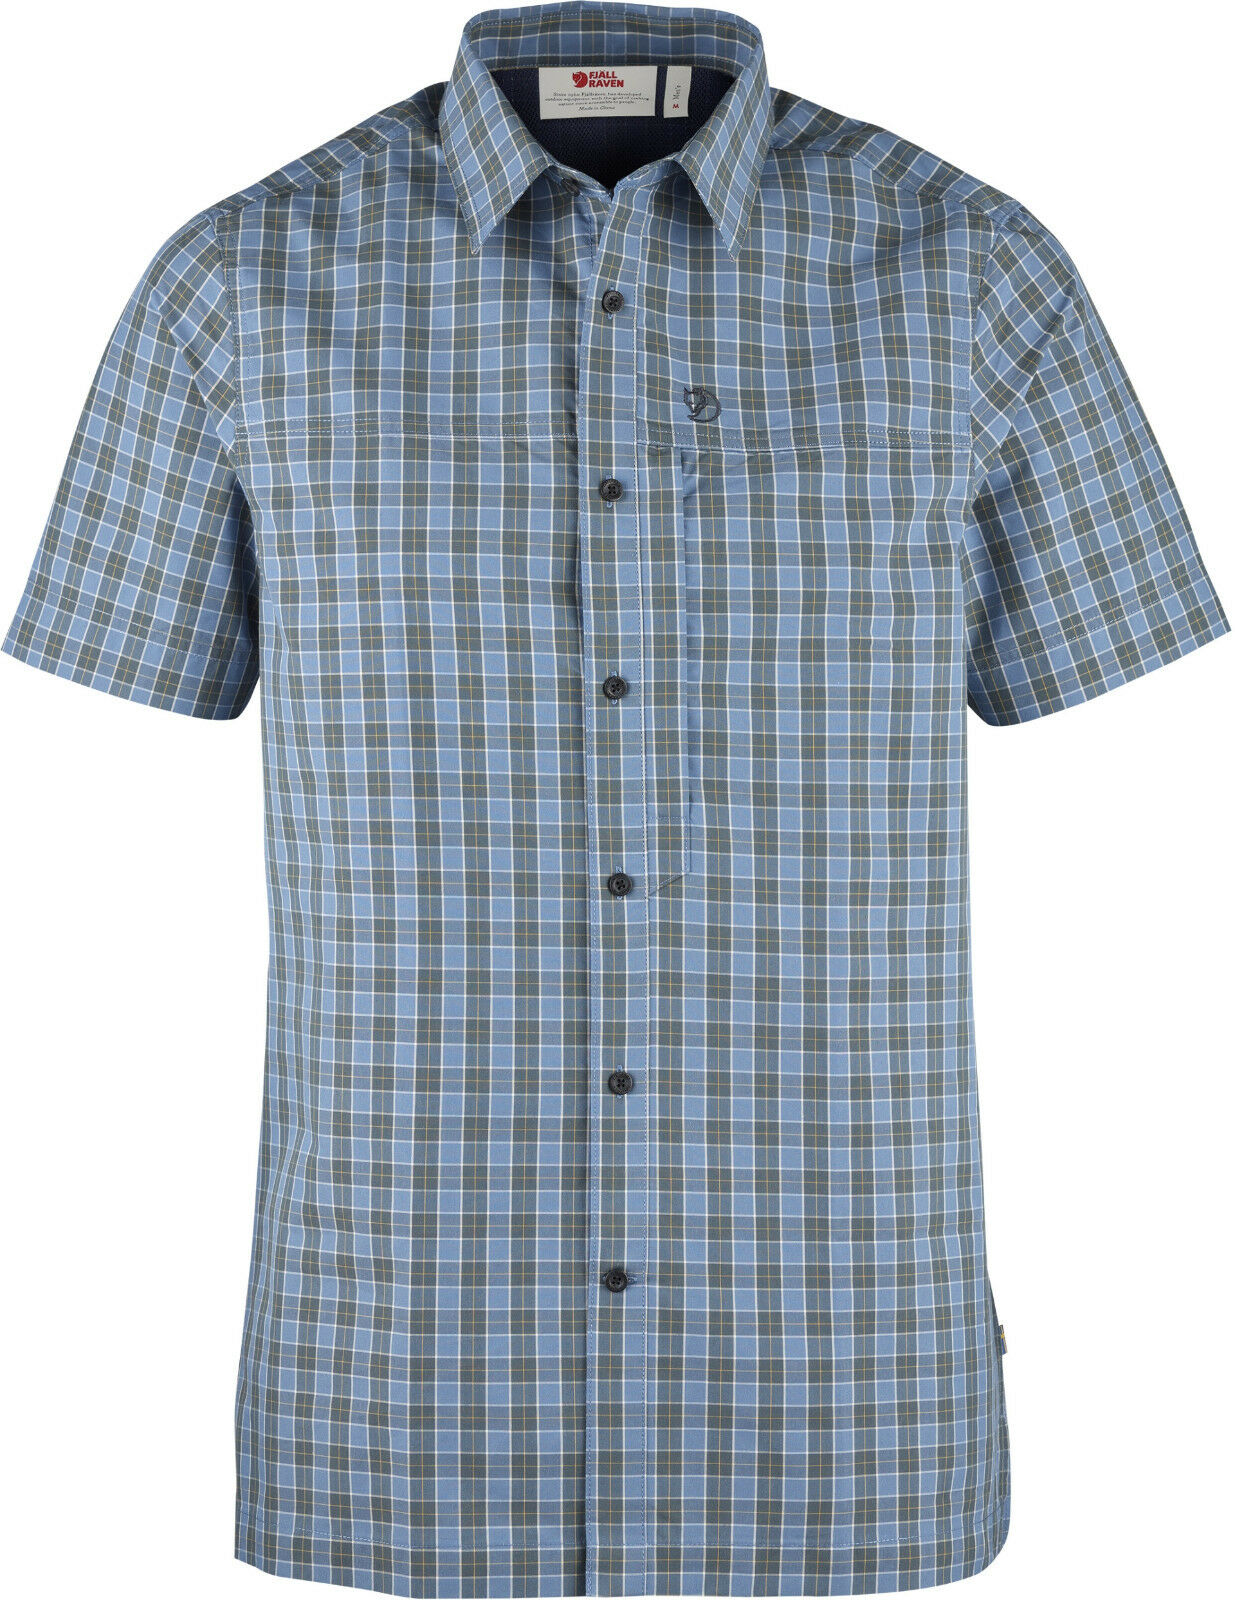 Fjällräven Svante camisa SS 81922 azul Ridge camisa para hombre manga corta Camisa outdoorhemd